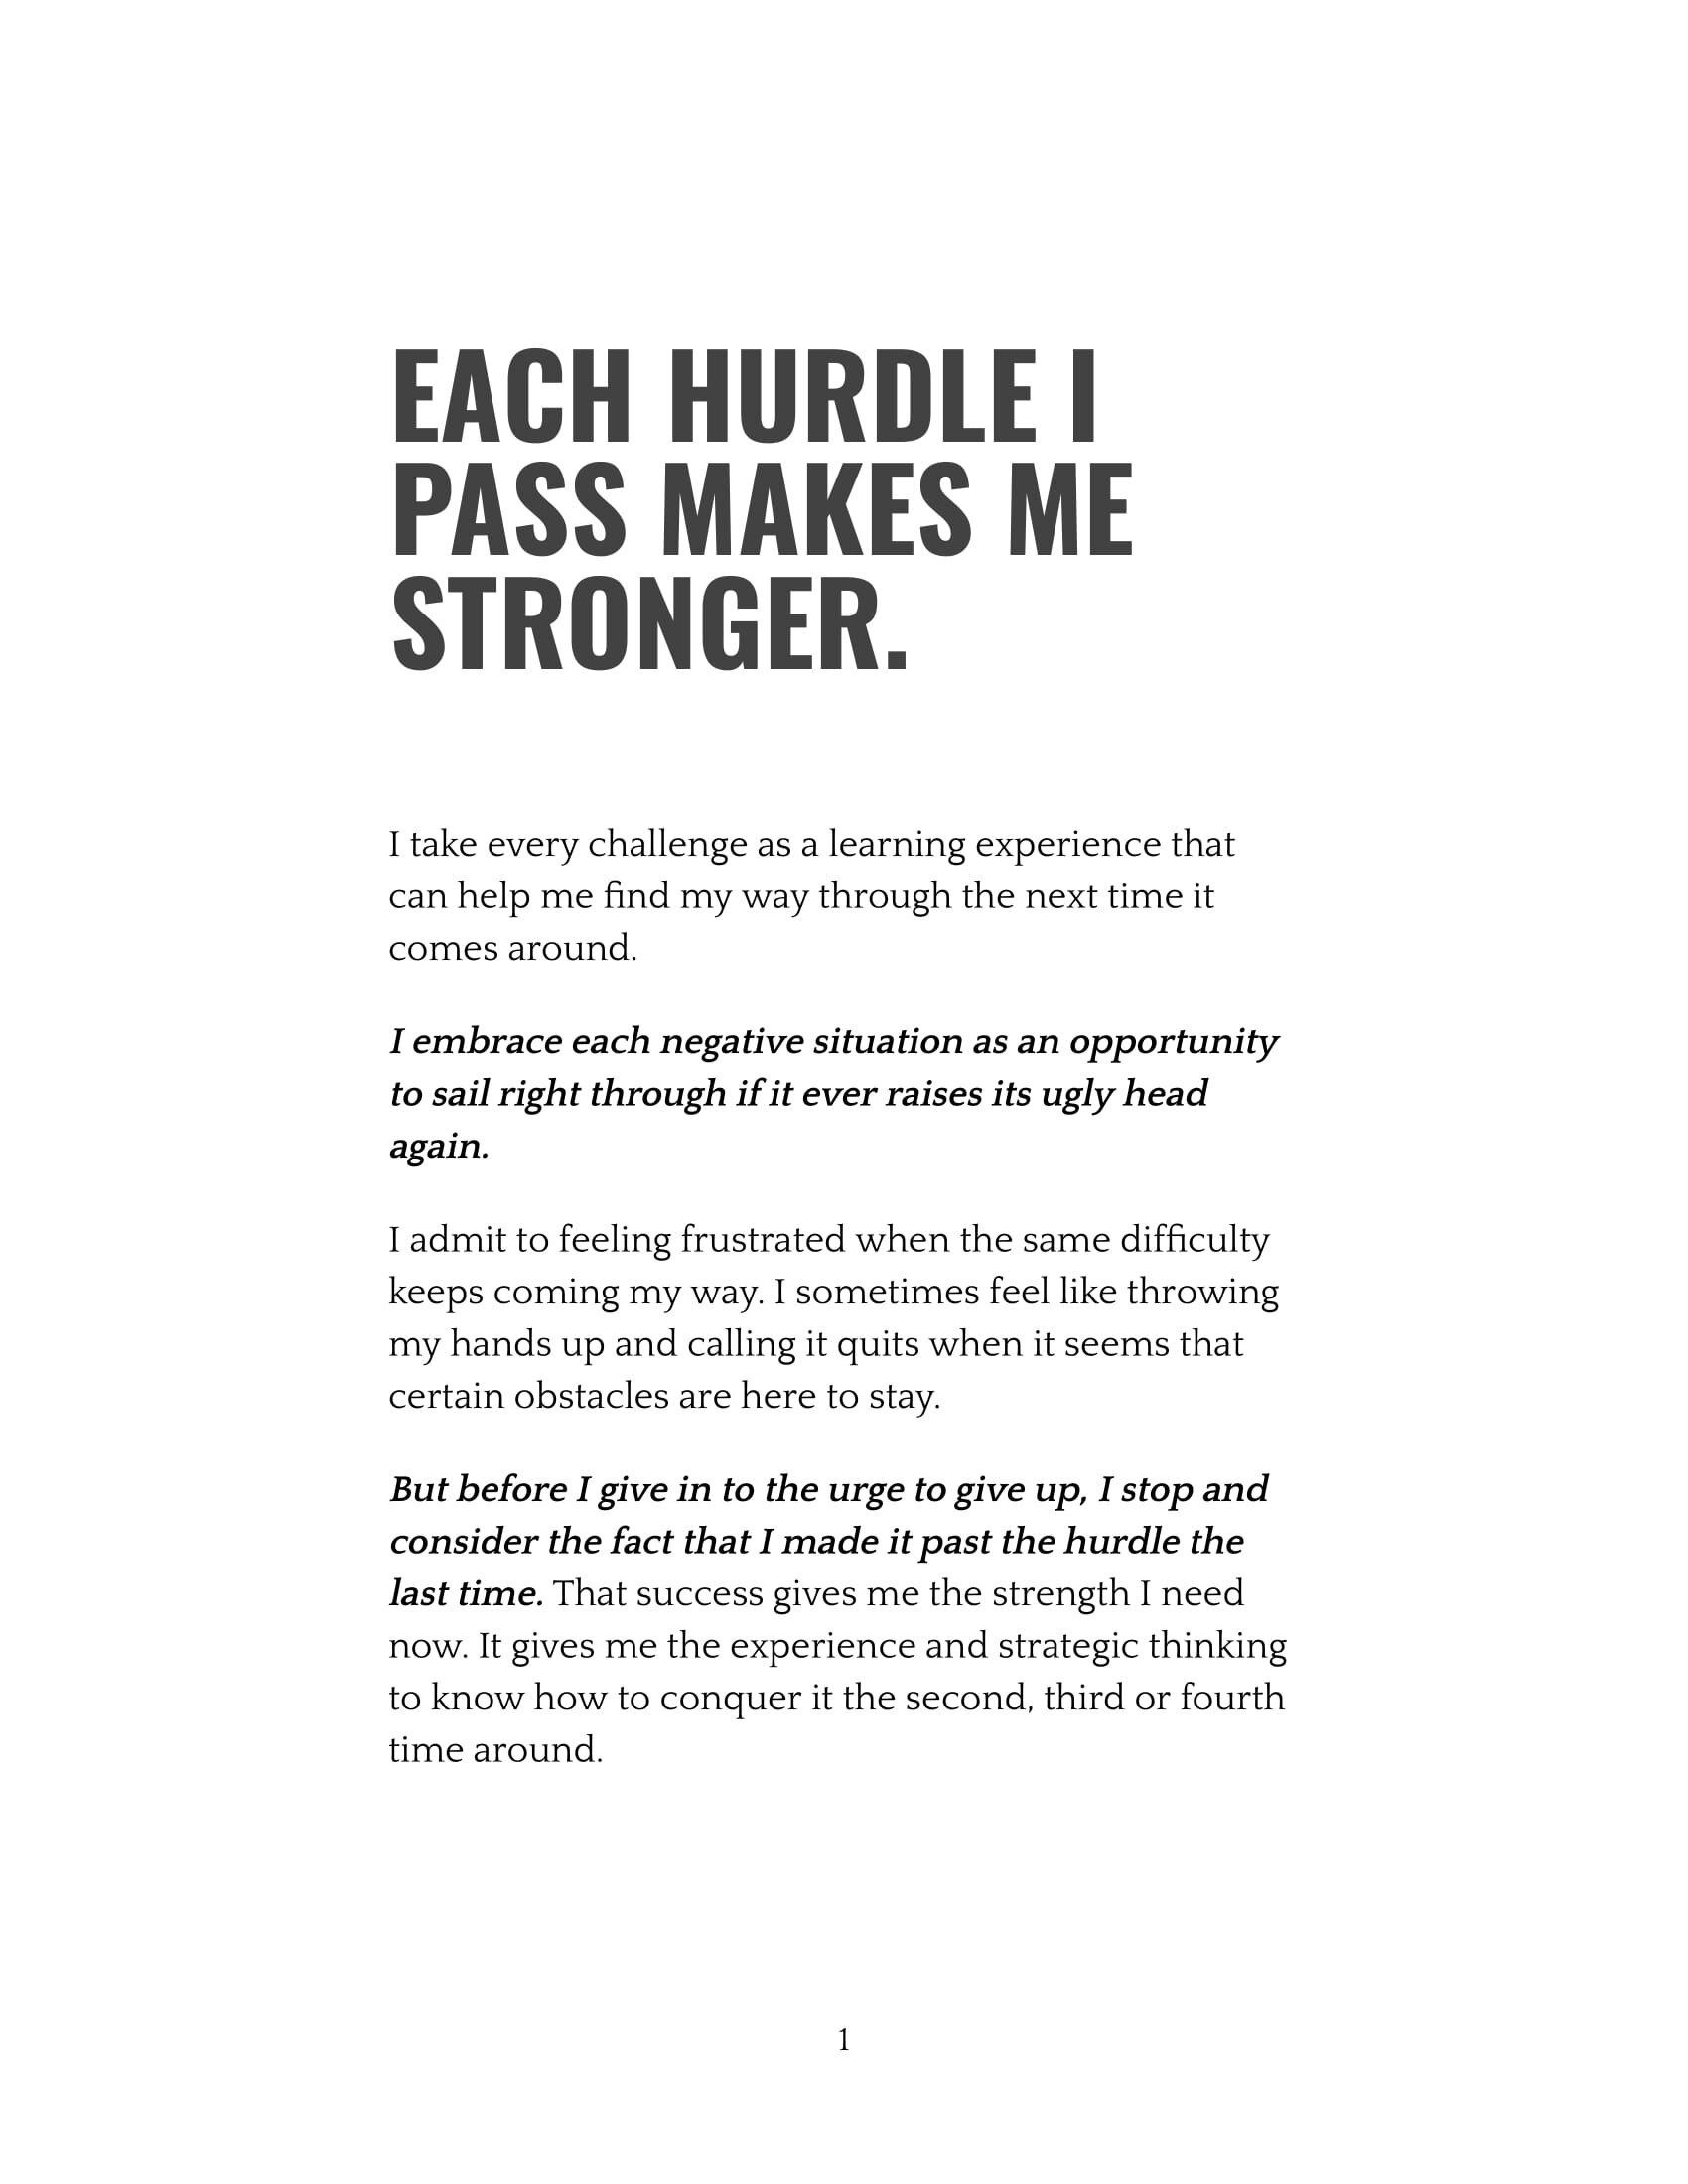 Each Hurdle I Pass Makes Me Stronger-1.jpg